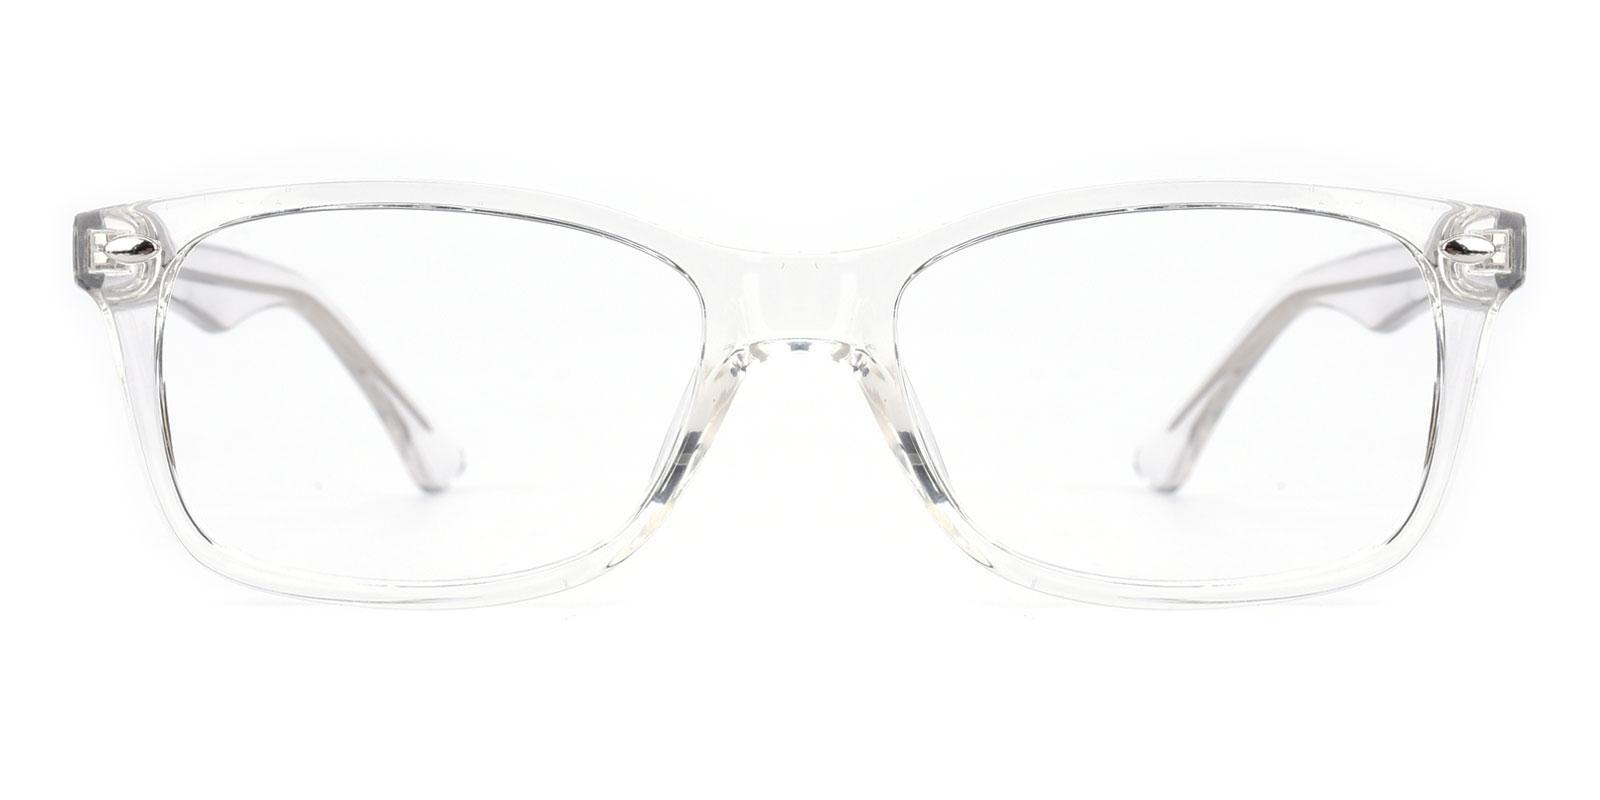 Eve-Translucent-Rectangle-TR-Eyeglasses-detail